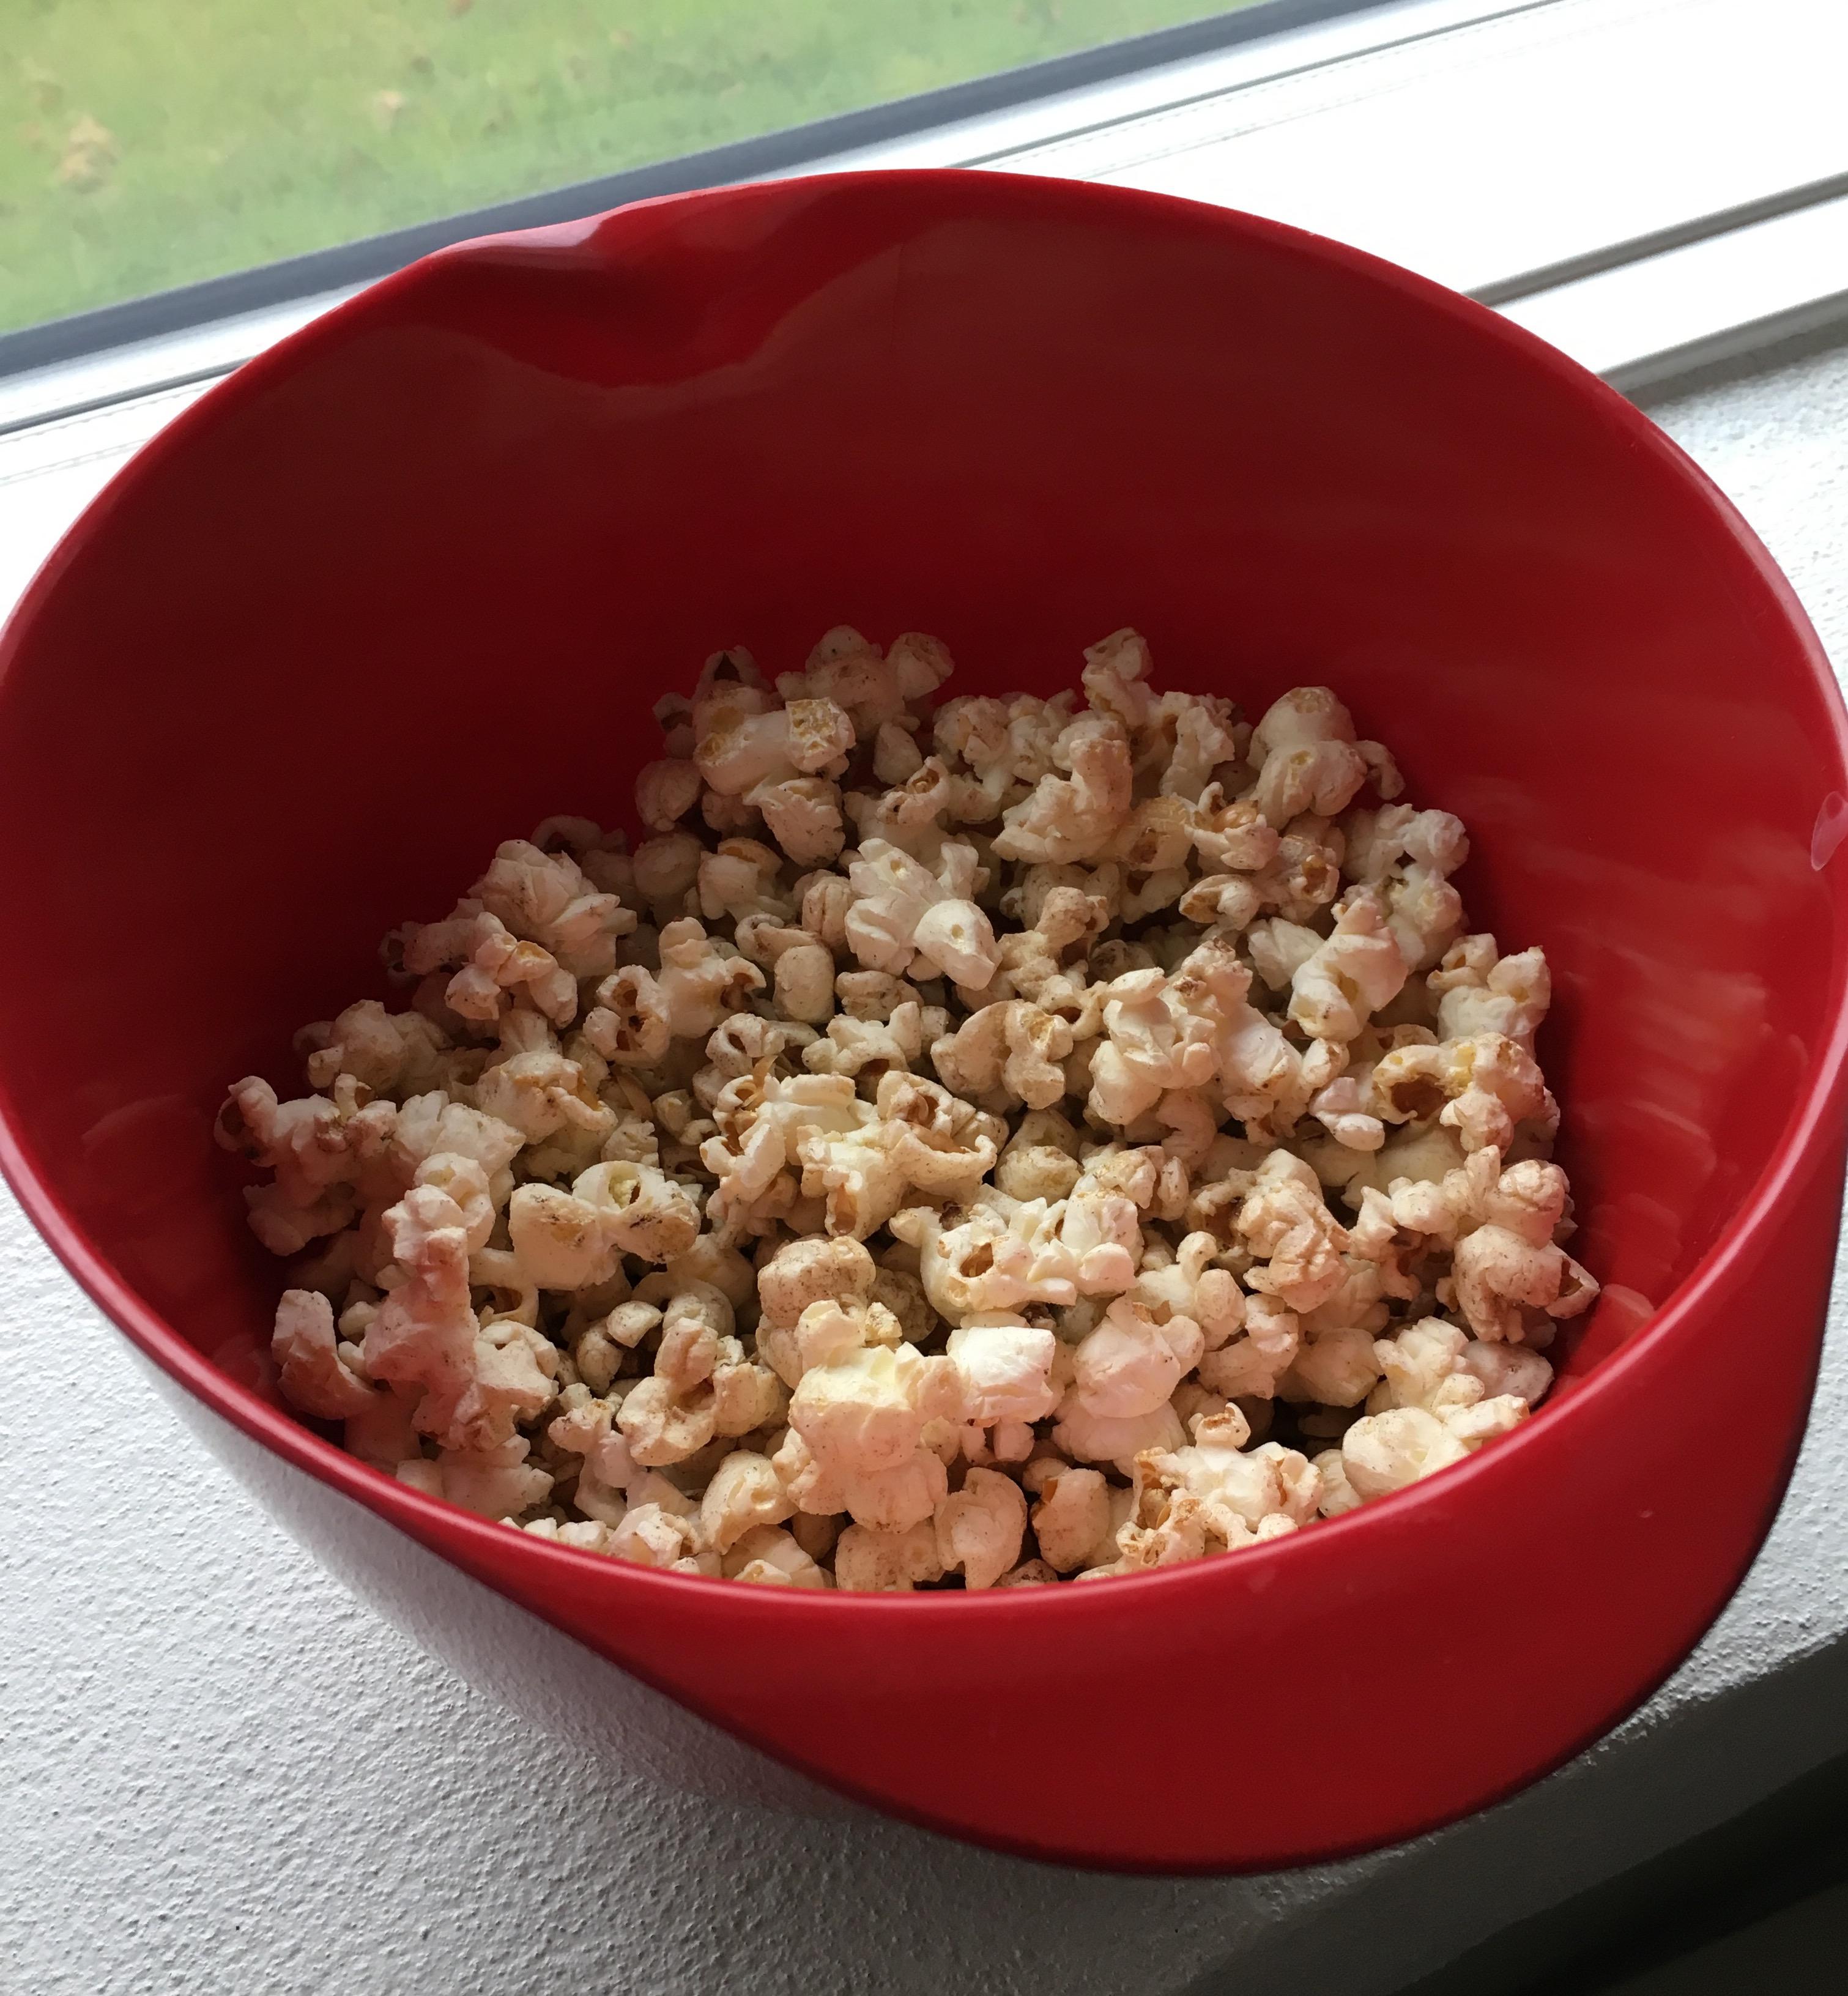 Popcorn...;)